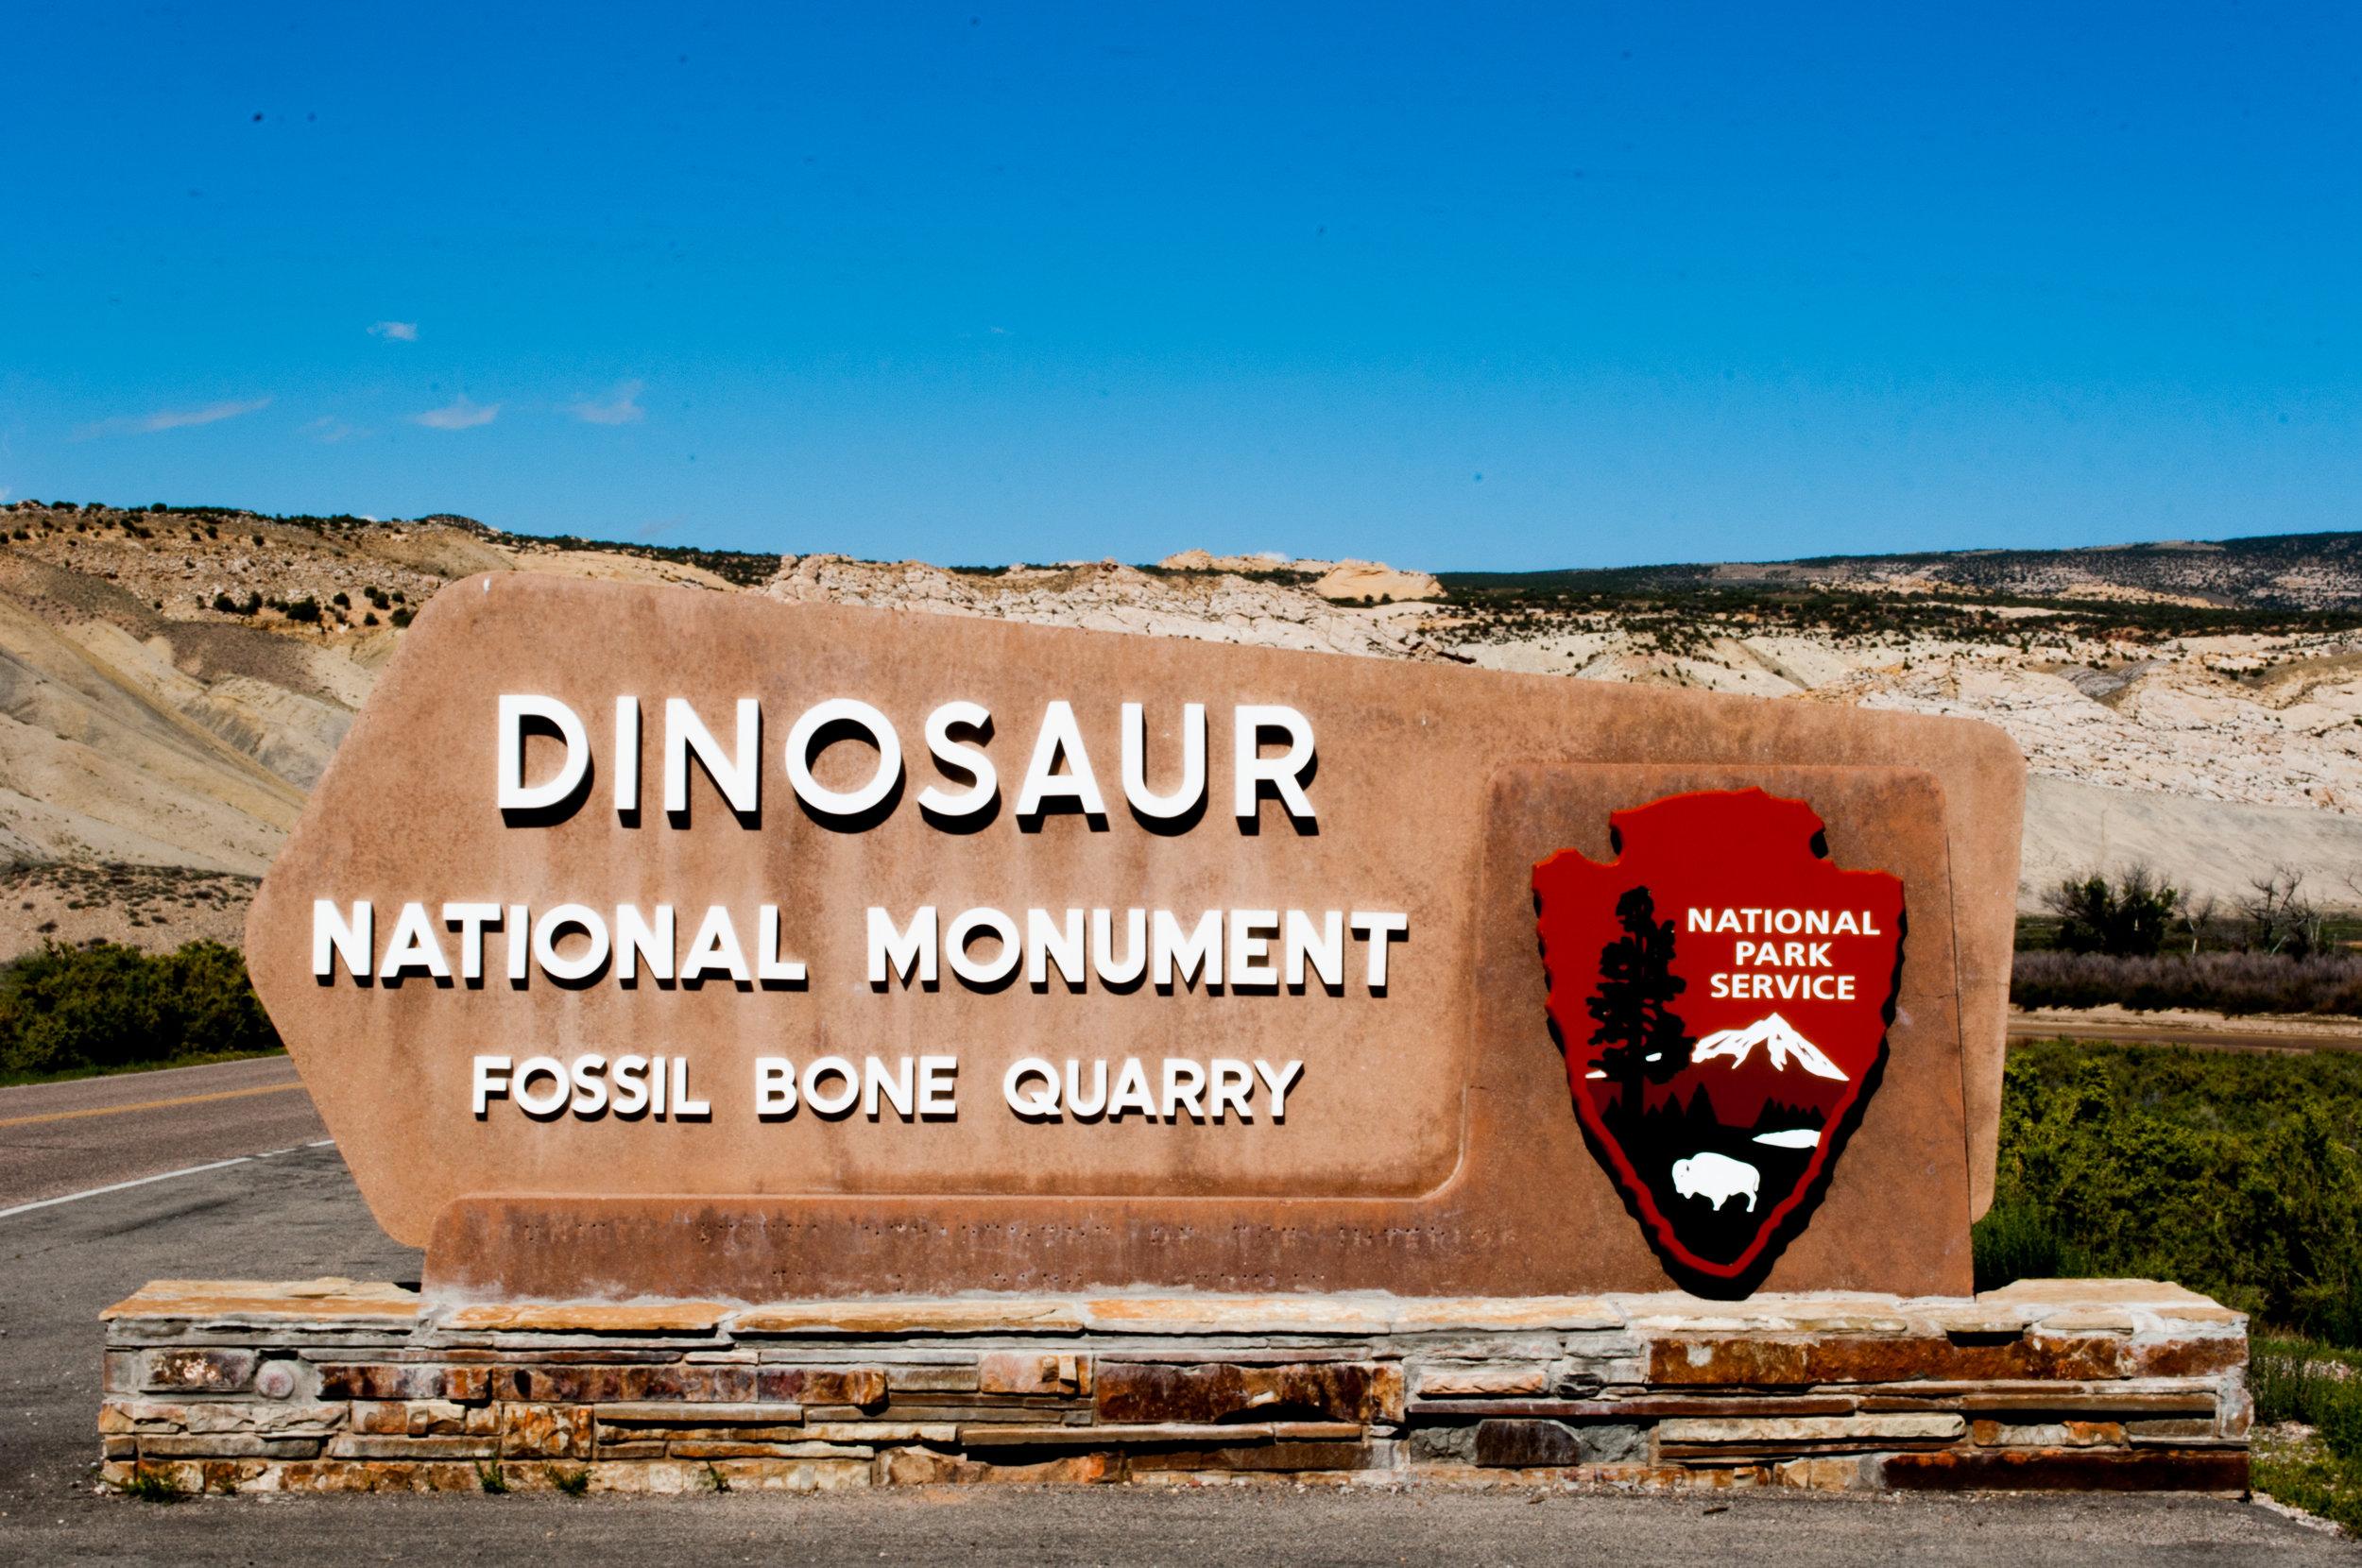 140910. DinosaurNM (31).jpg